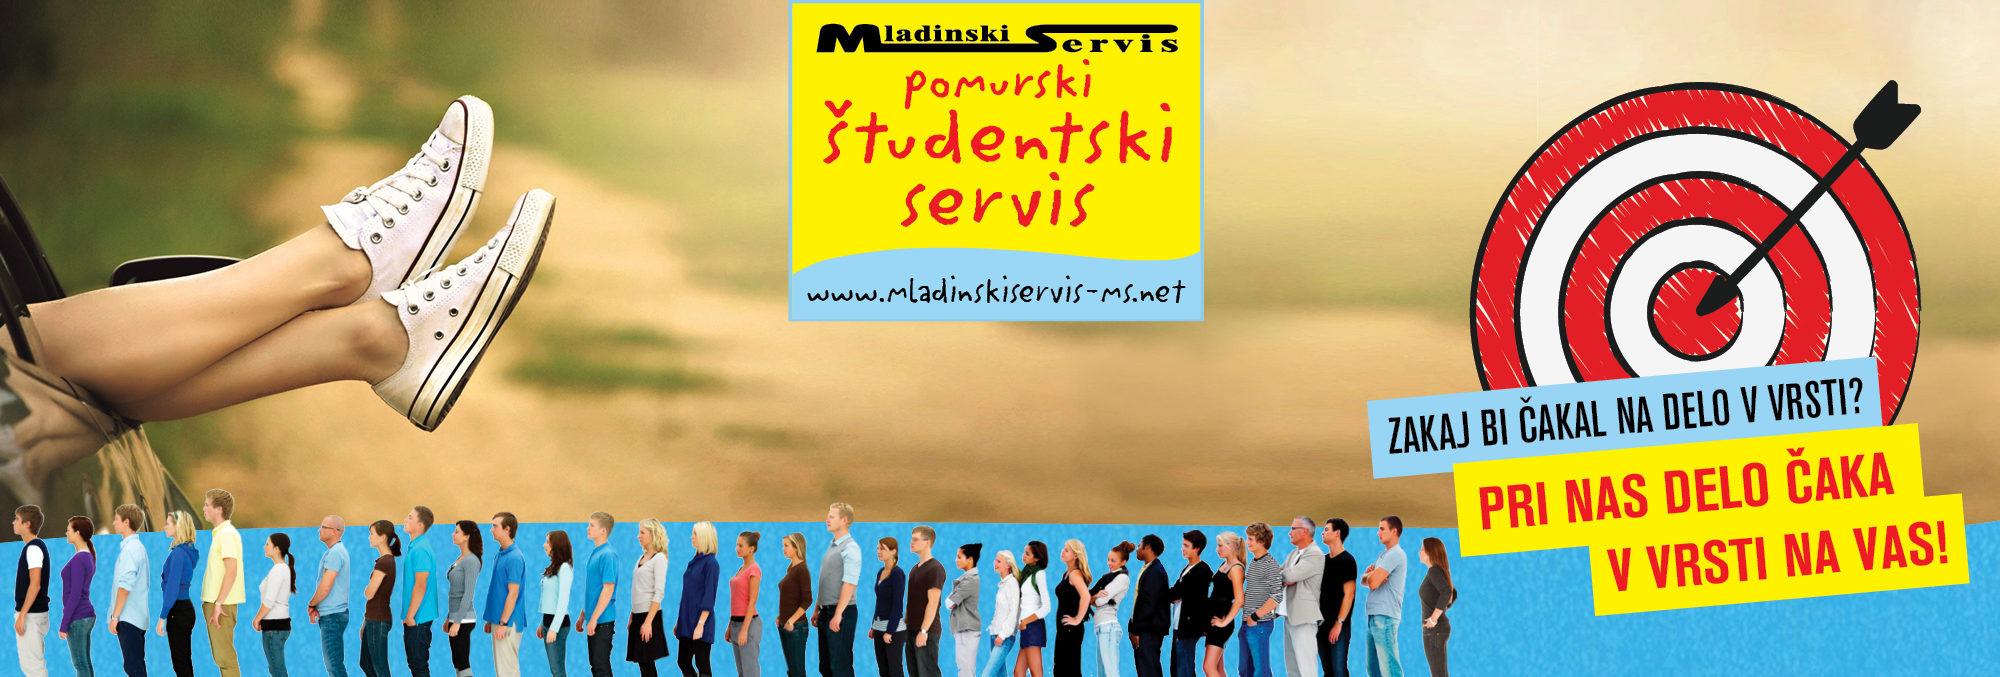 Mladinski servis Murska Sobota